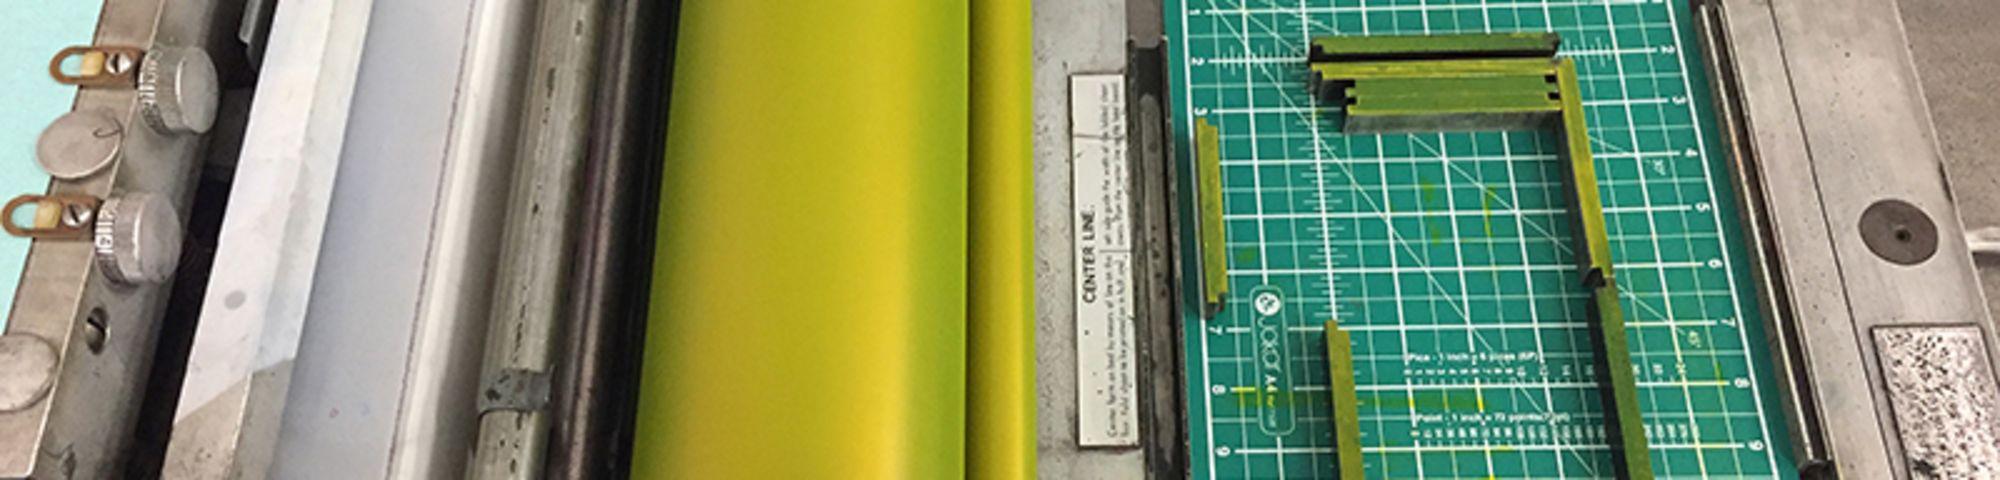 Pantone Yellow on active interlocking furniture